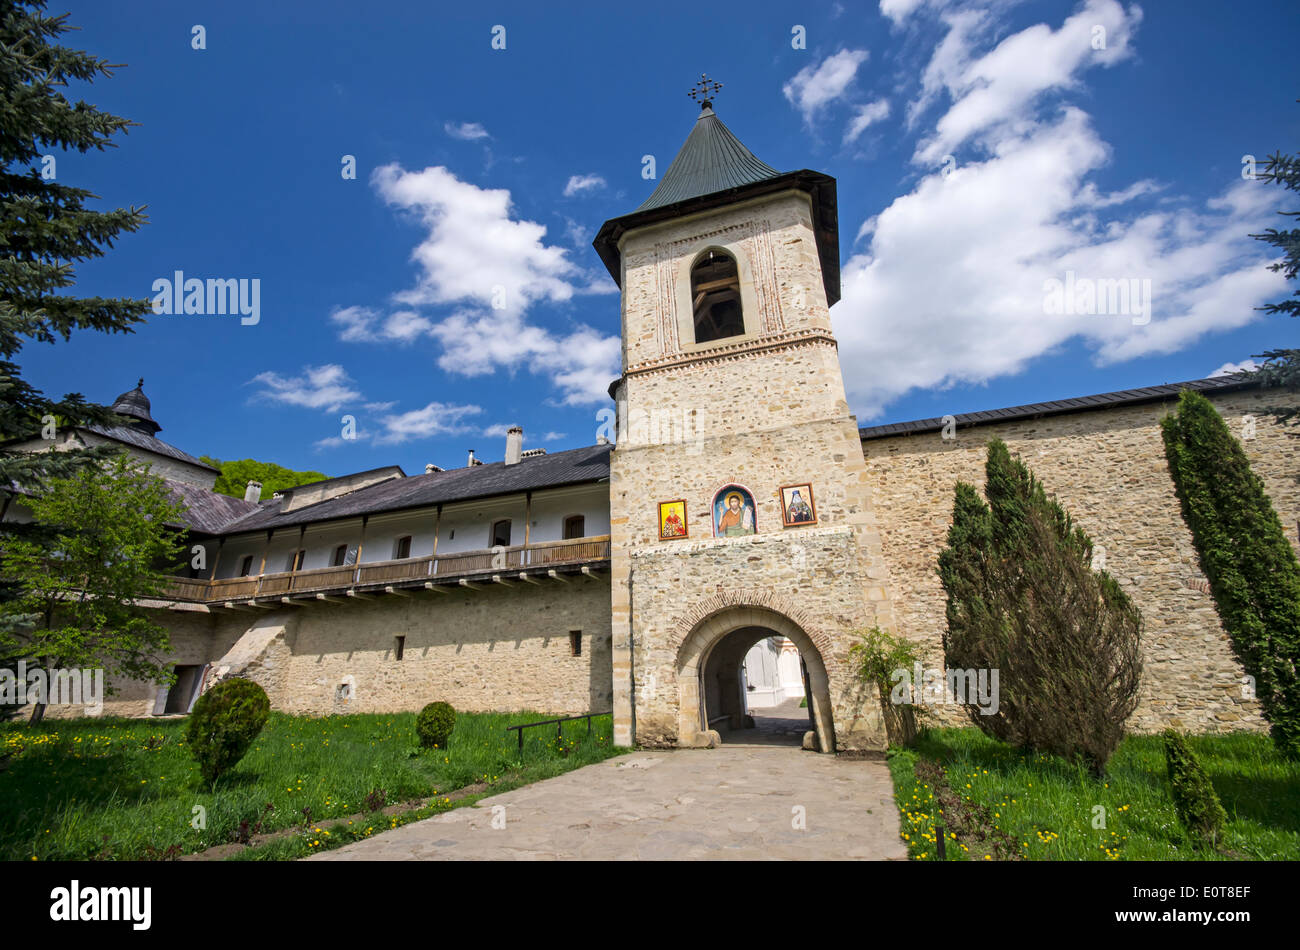 Secu monastery surrounding stone walls and entrance tower, Moldavia - Romania - Stock Image